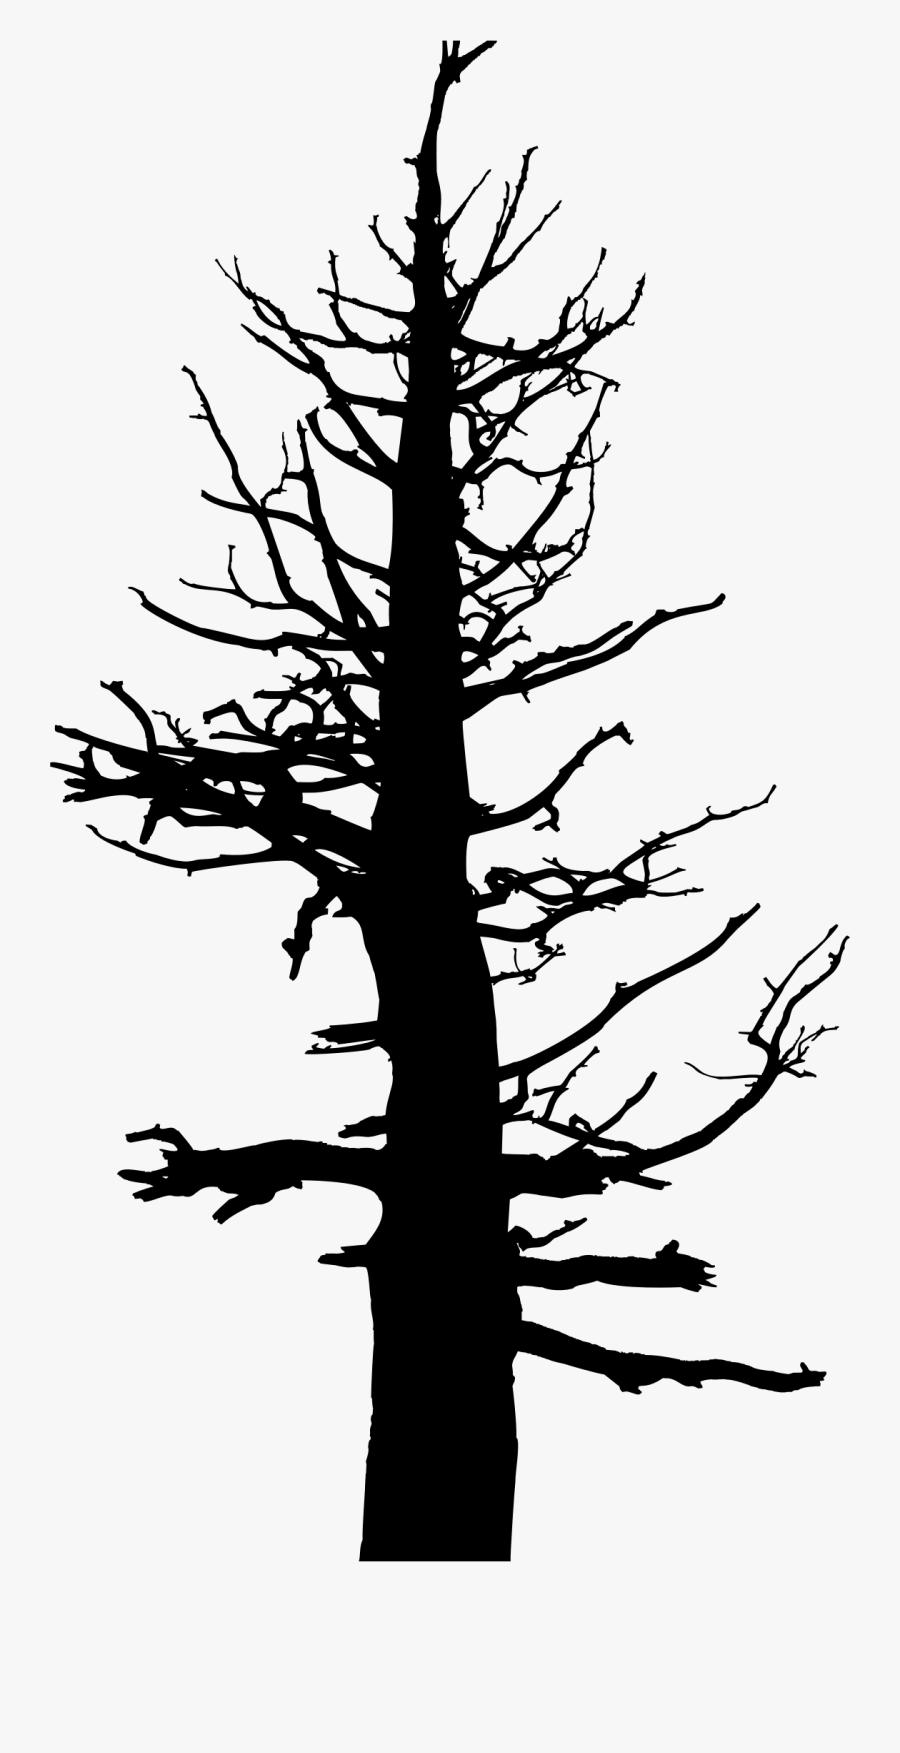 Dead Tree Trunk Clip Art Clipart Free Download - Dead Pine Tree Silhouette, Transparent Clipart